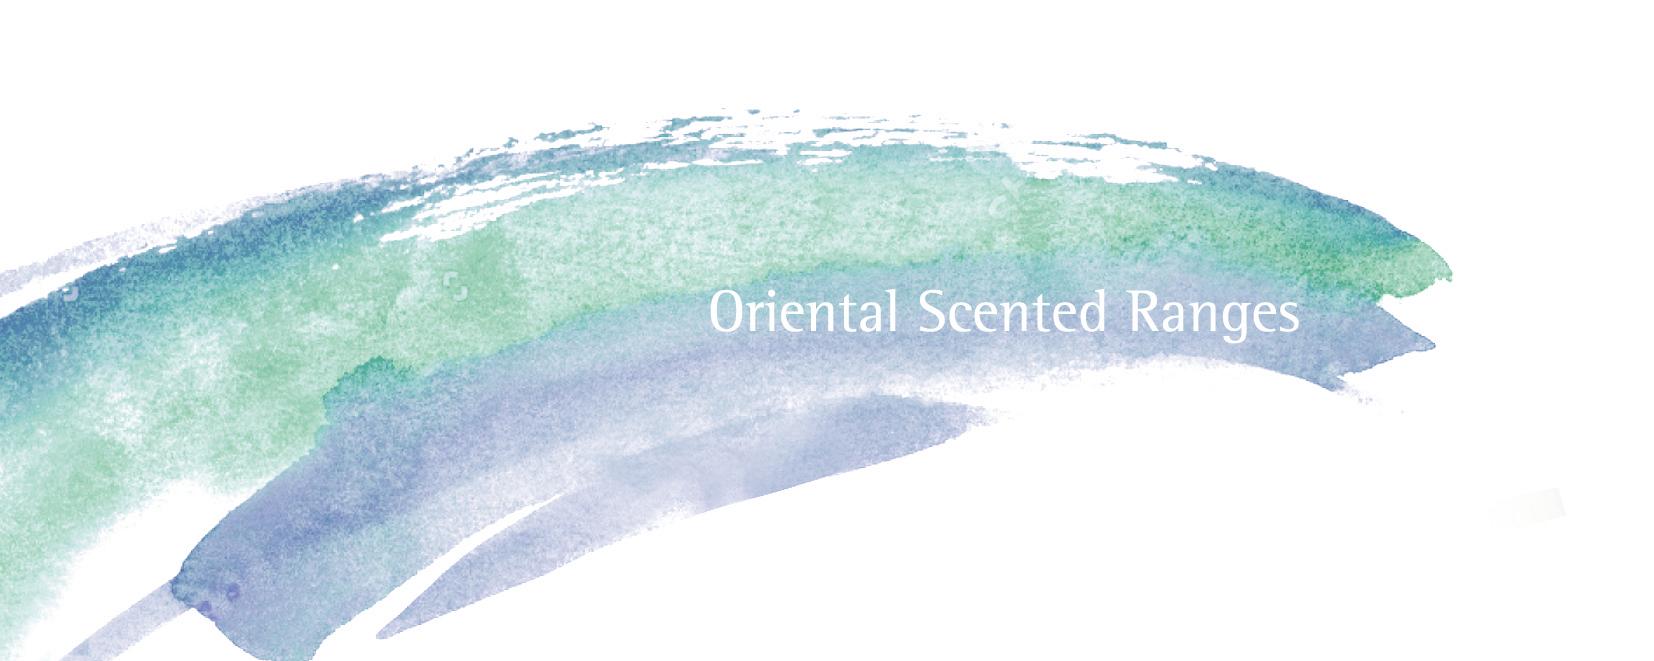 ori-scent.jpg